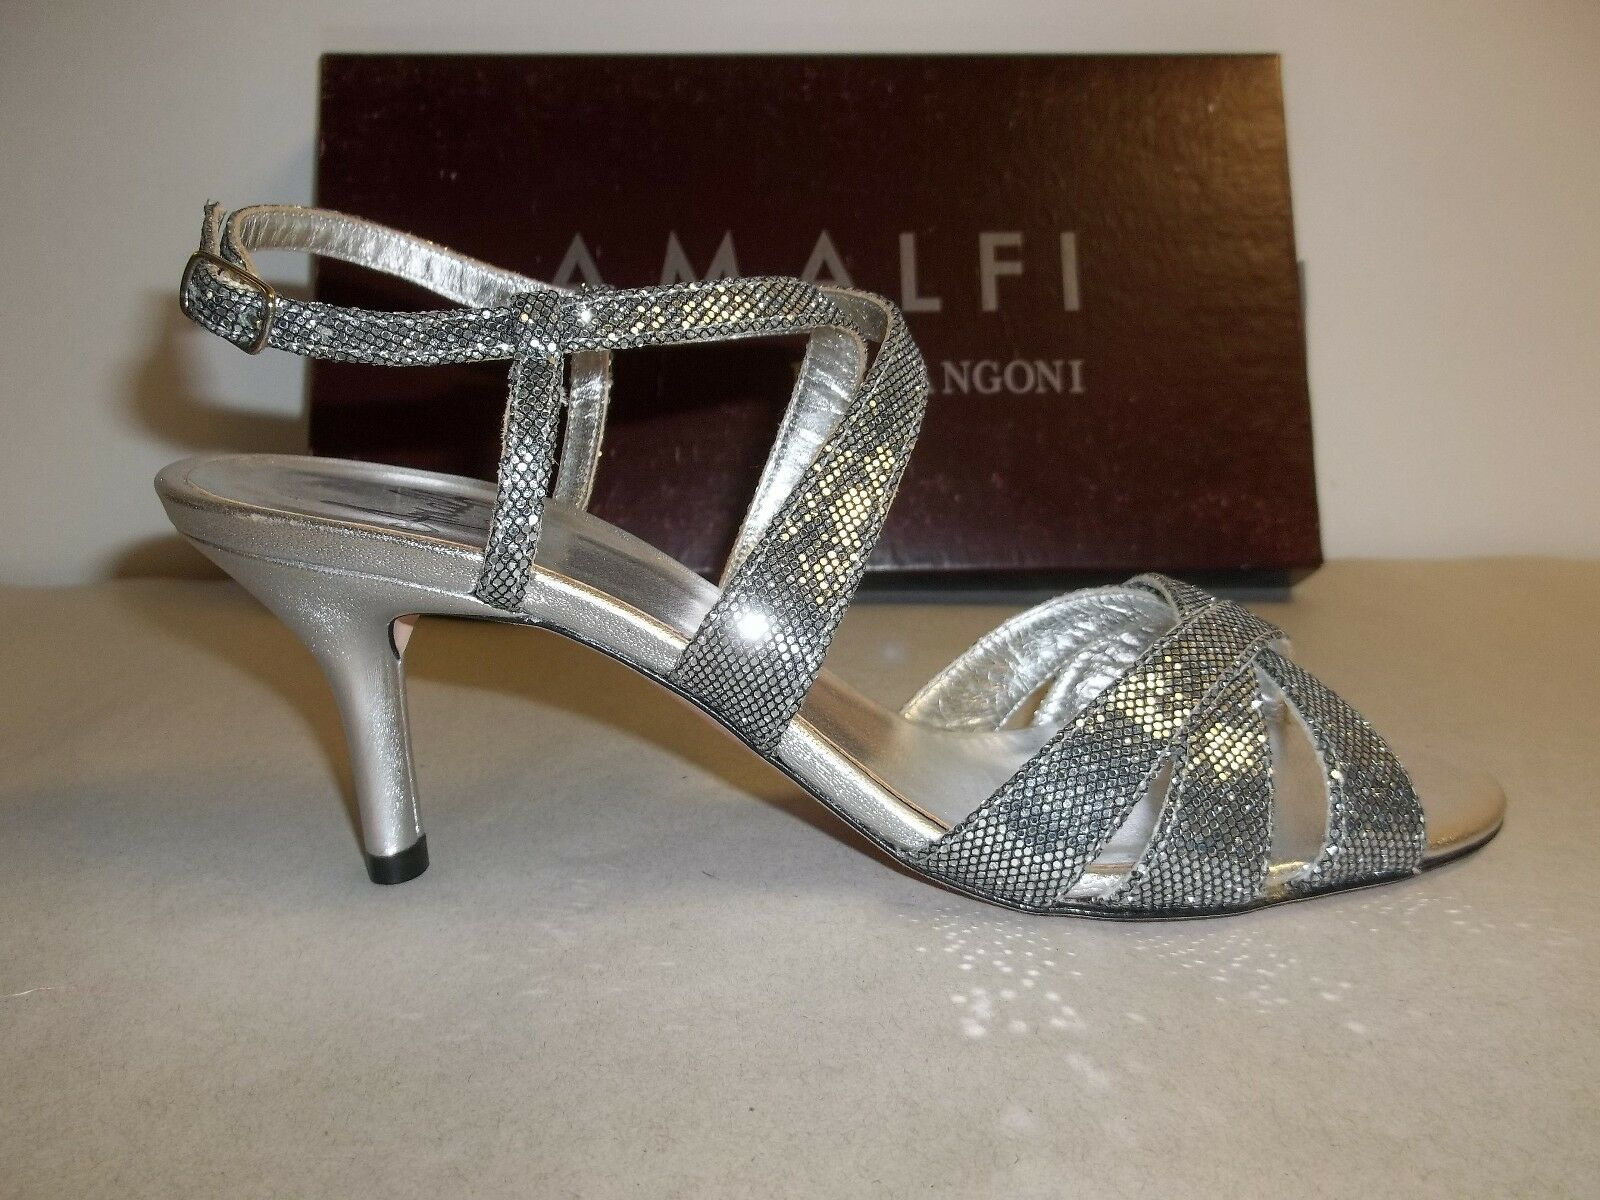 Amalfi by Rangoni Größe 6 M Colle Silver Glitter Heels Sandales NEU Damenschuhe Schuhes